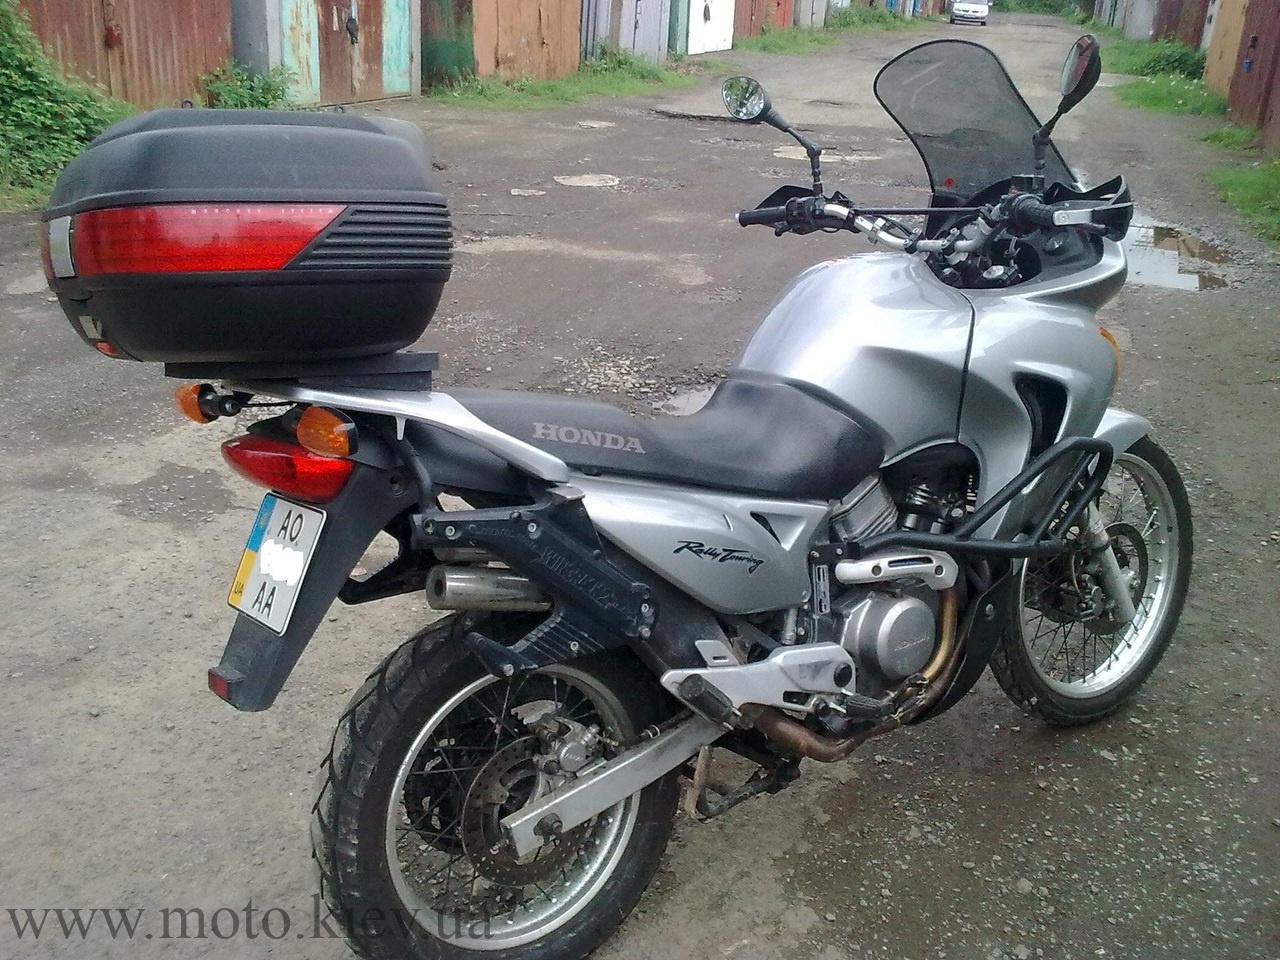 SUBJ: Мотоцикл  Honda Transalp 650  5900 USD Торг